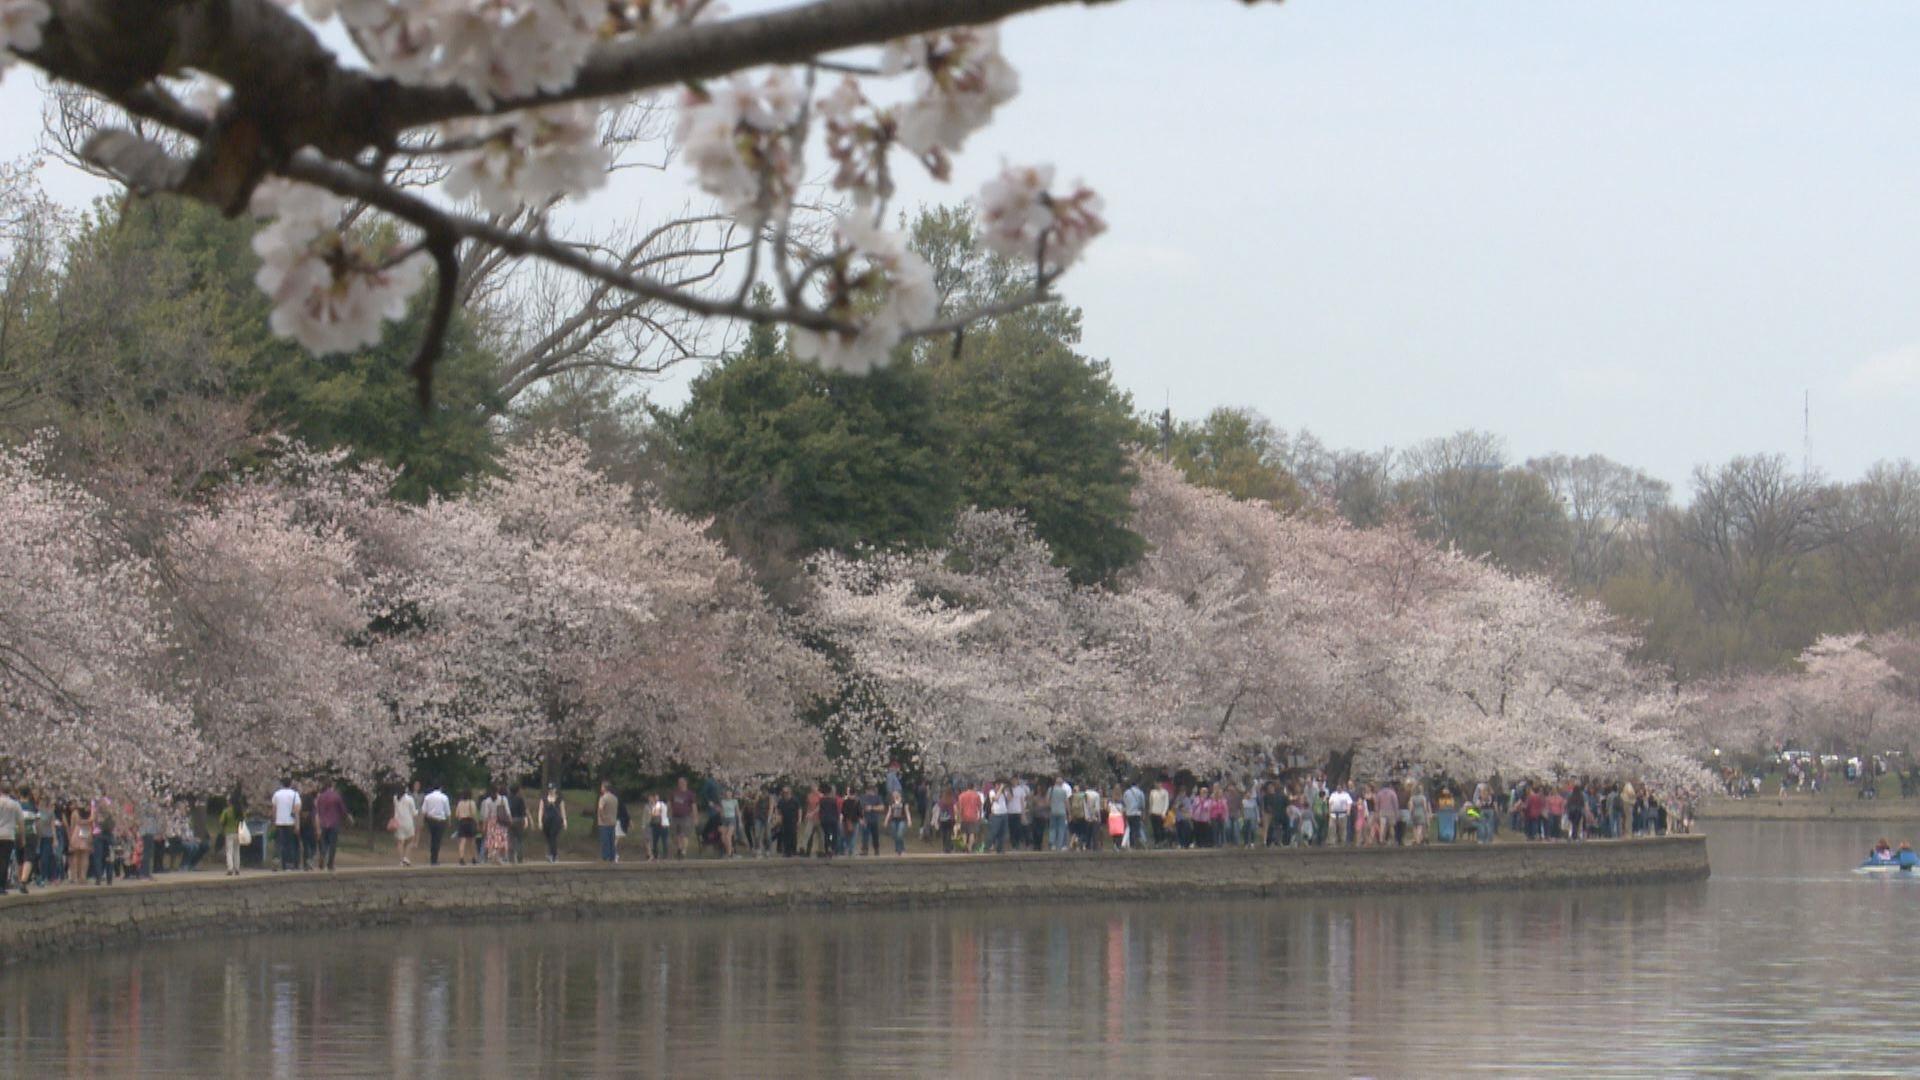 2017 Cherry blossoms peak bloom